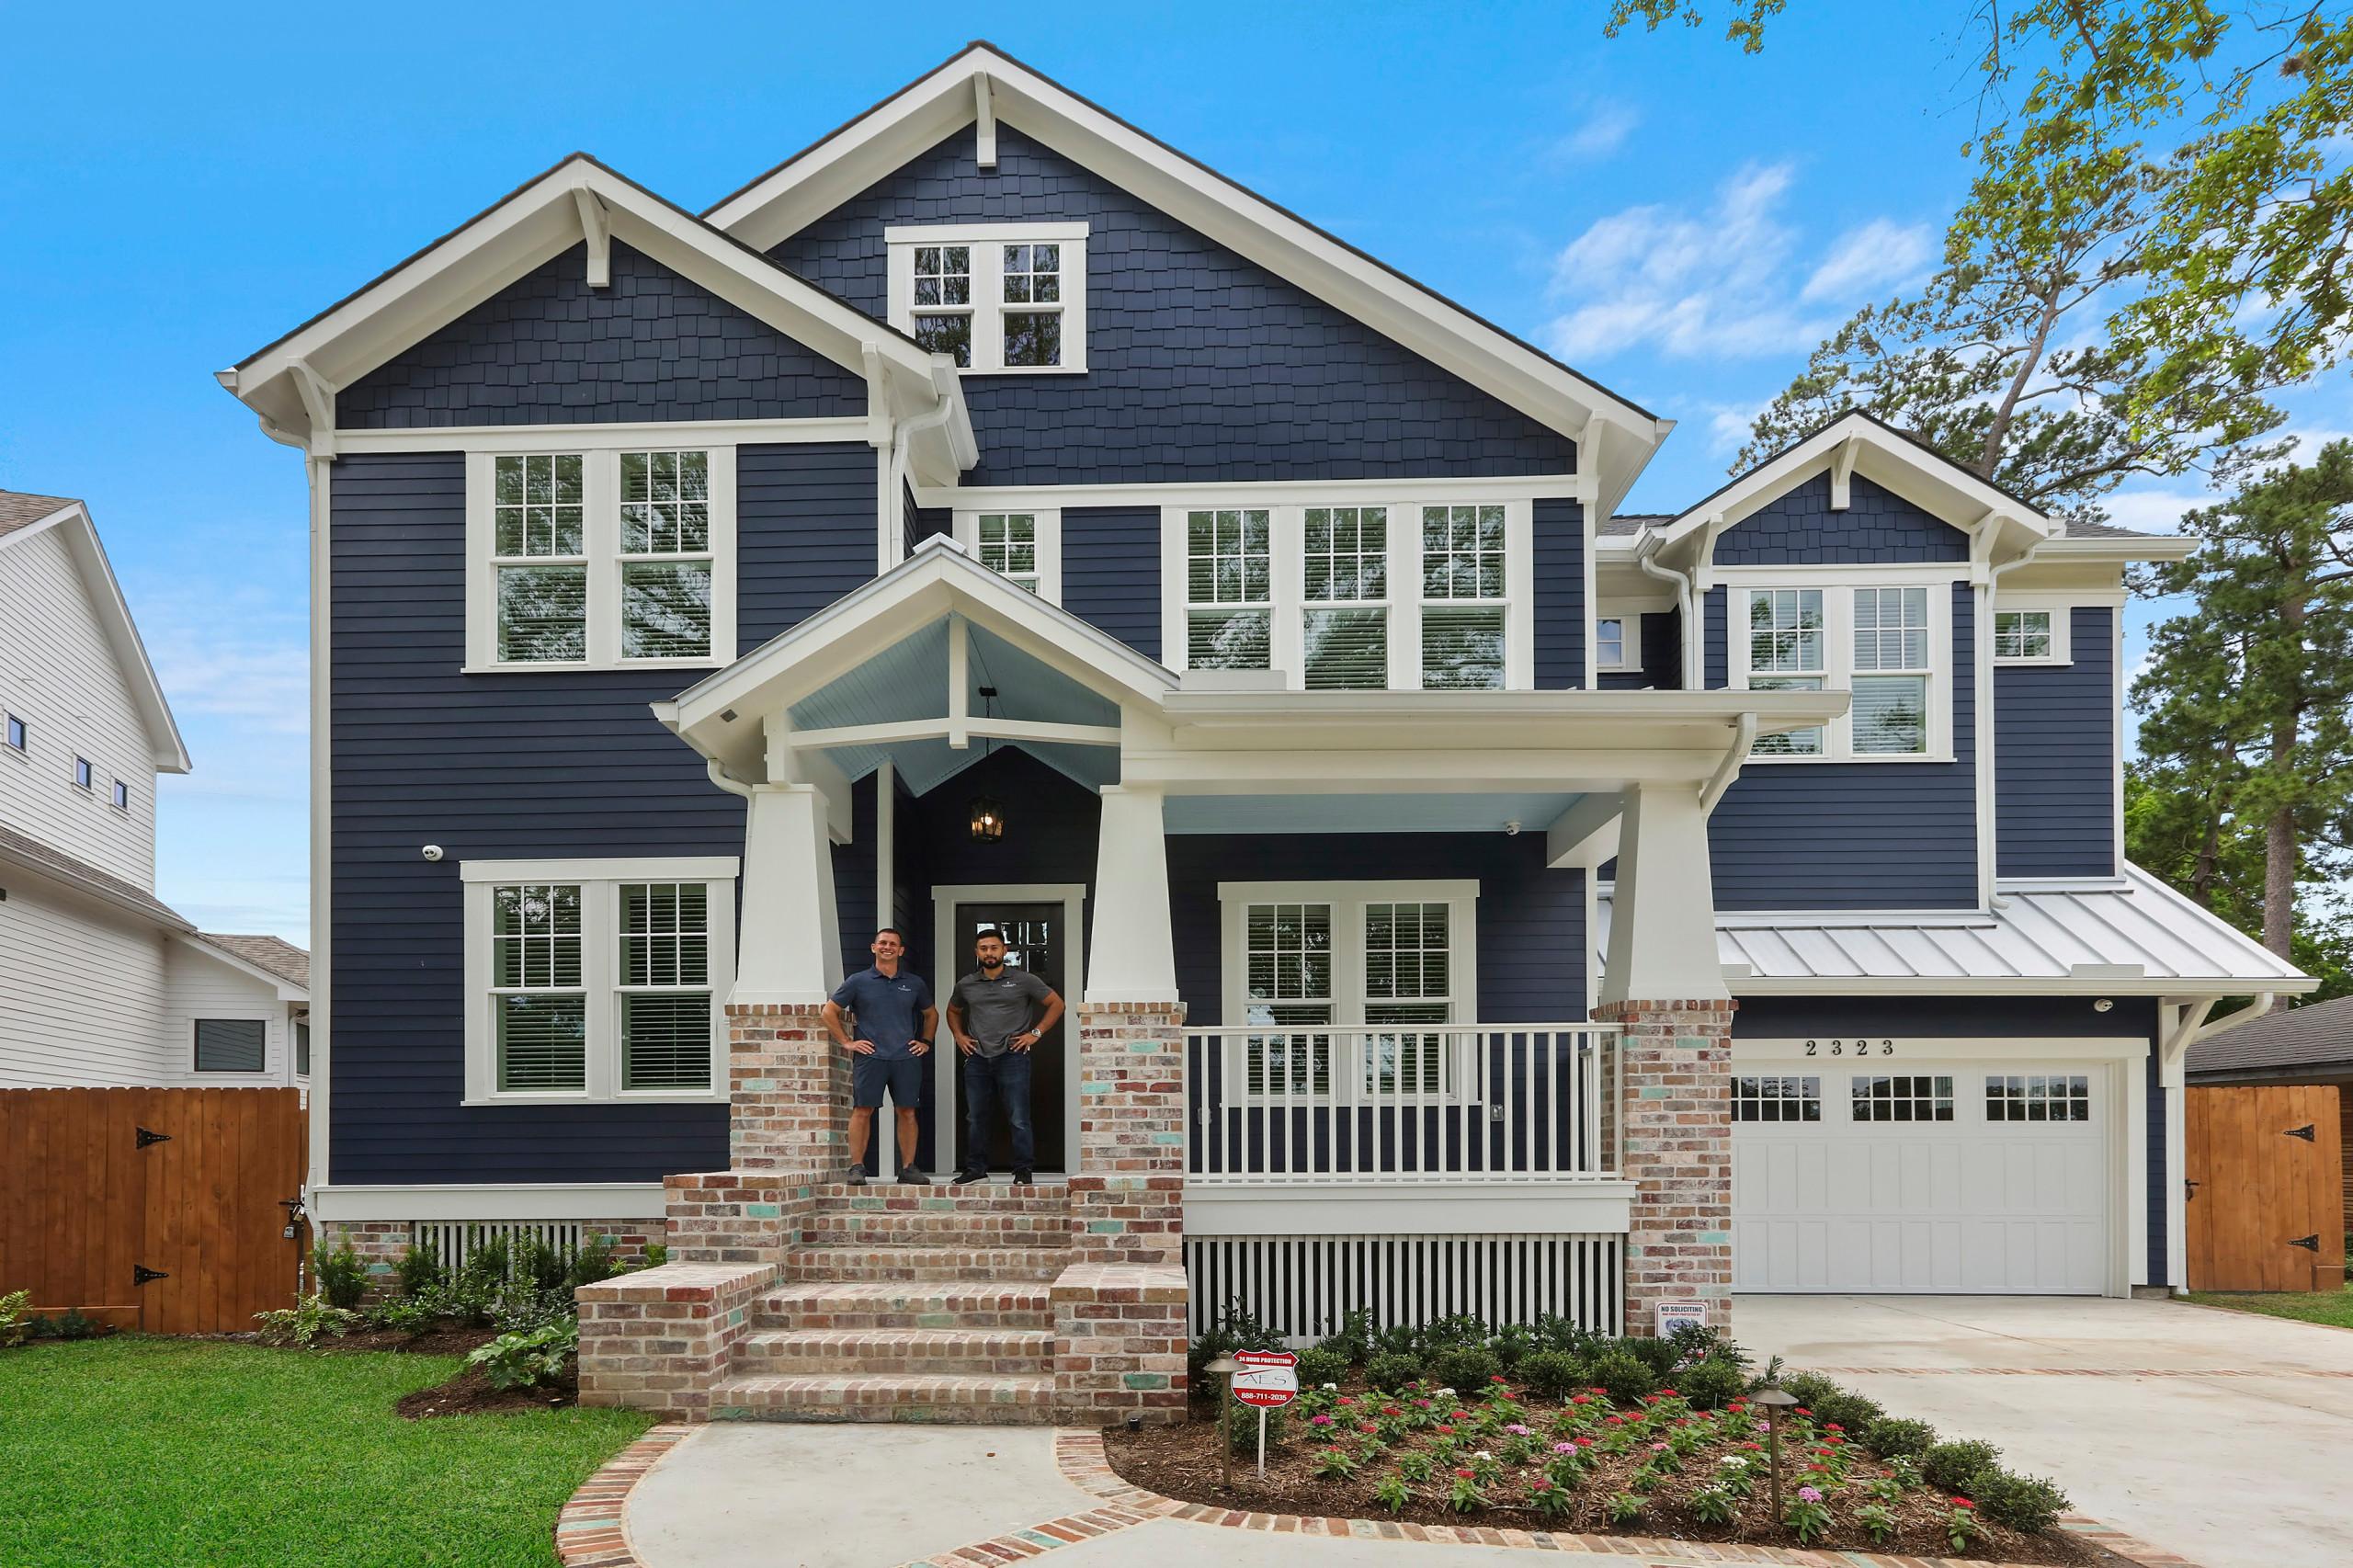 Dowdle-Sampson Residence